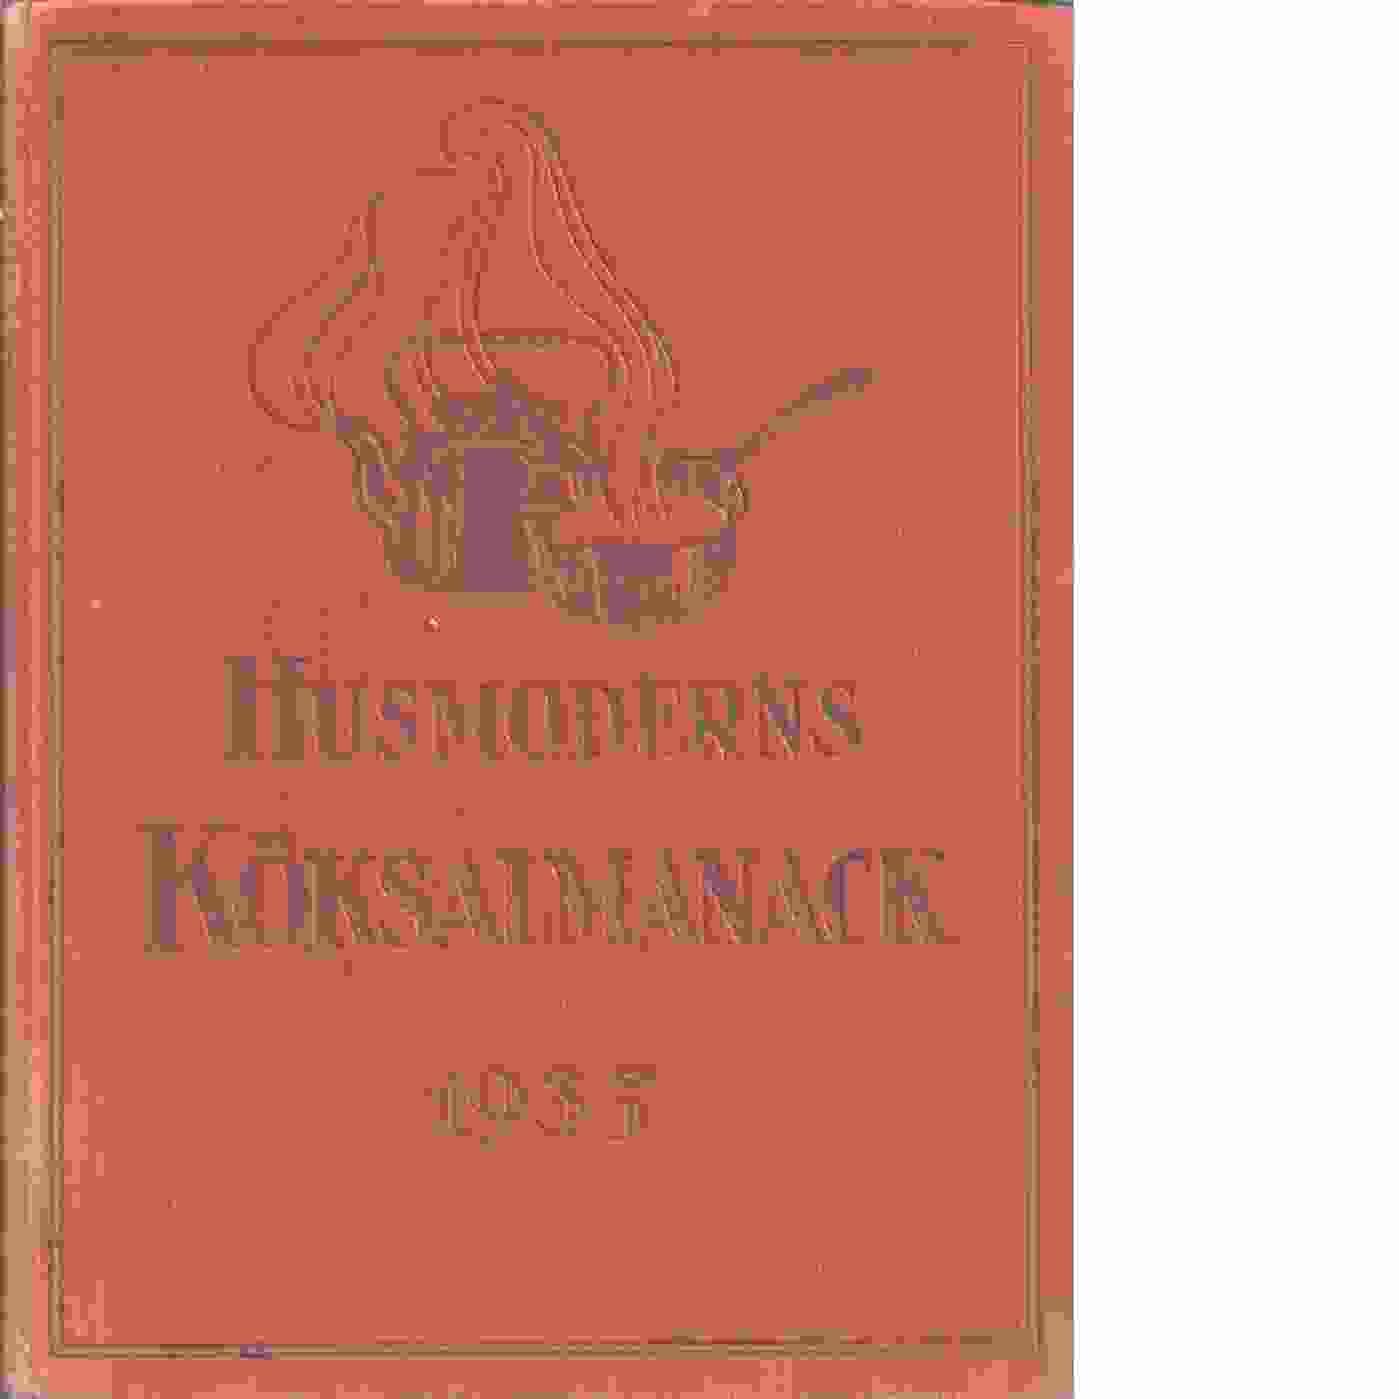 Husmoderns köksalmanack 1935 - Red.